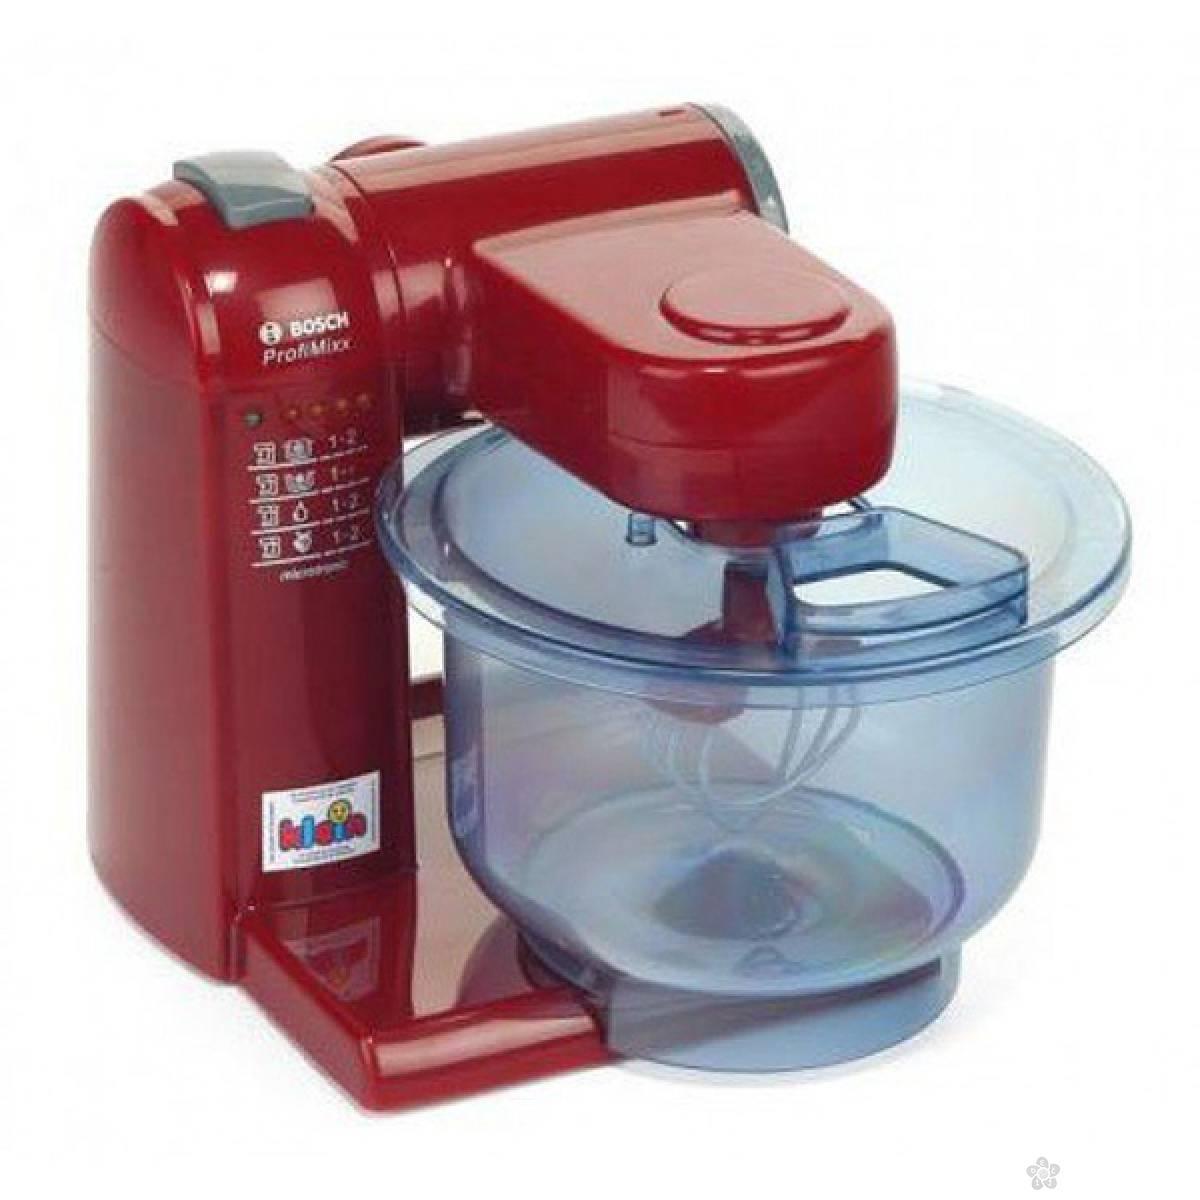 Bosch kuhinjski mikser crveno / sivi Klein KL9556